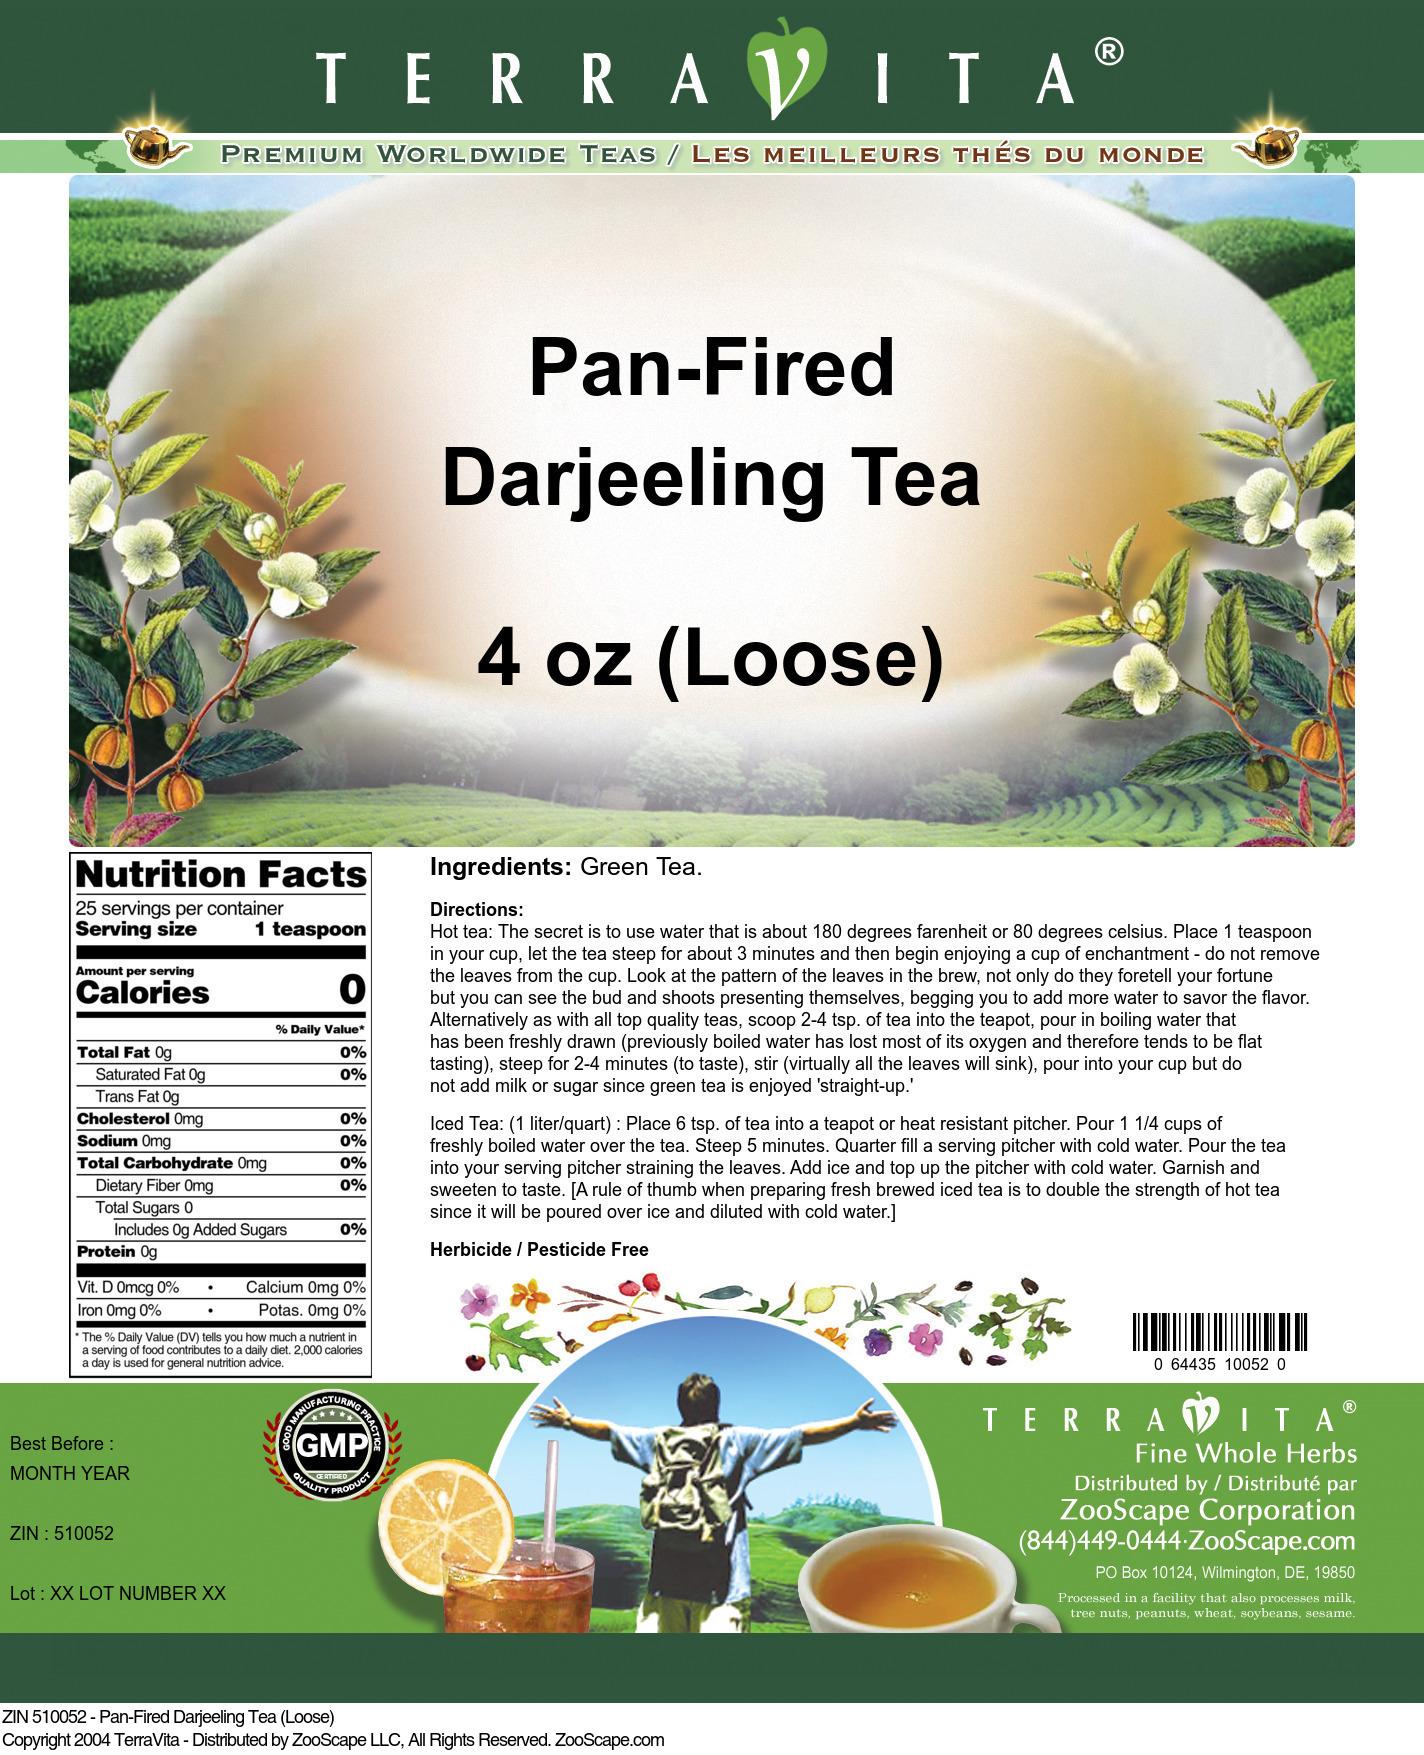 Pan-Fired Darjeeling